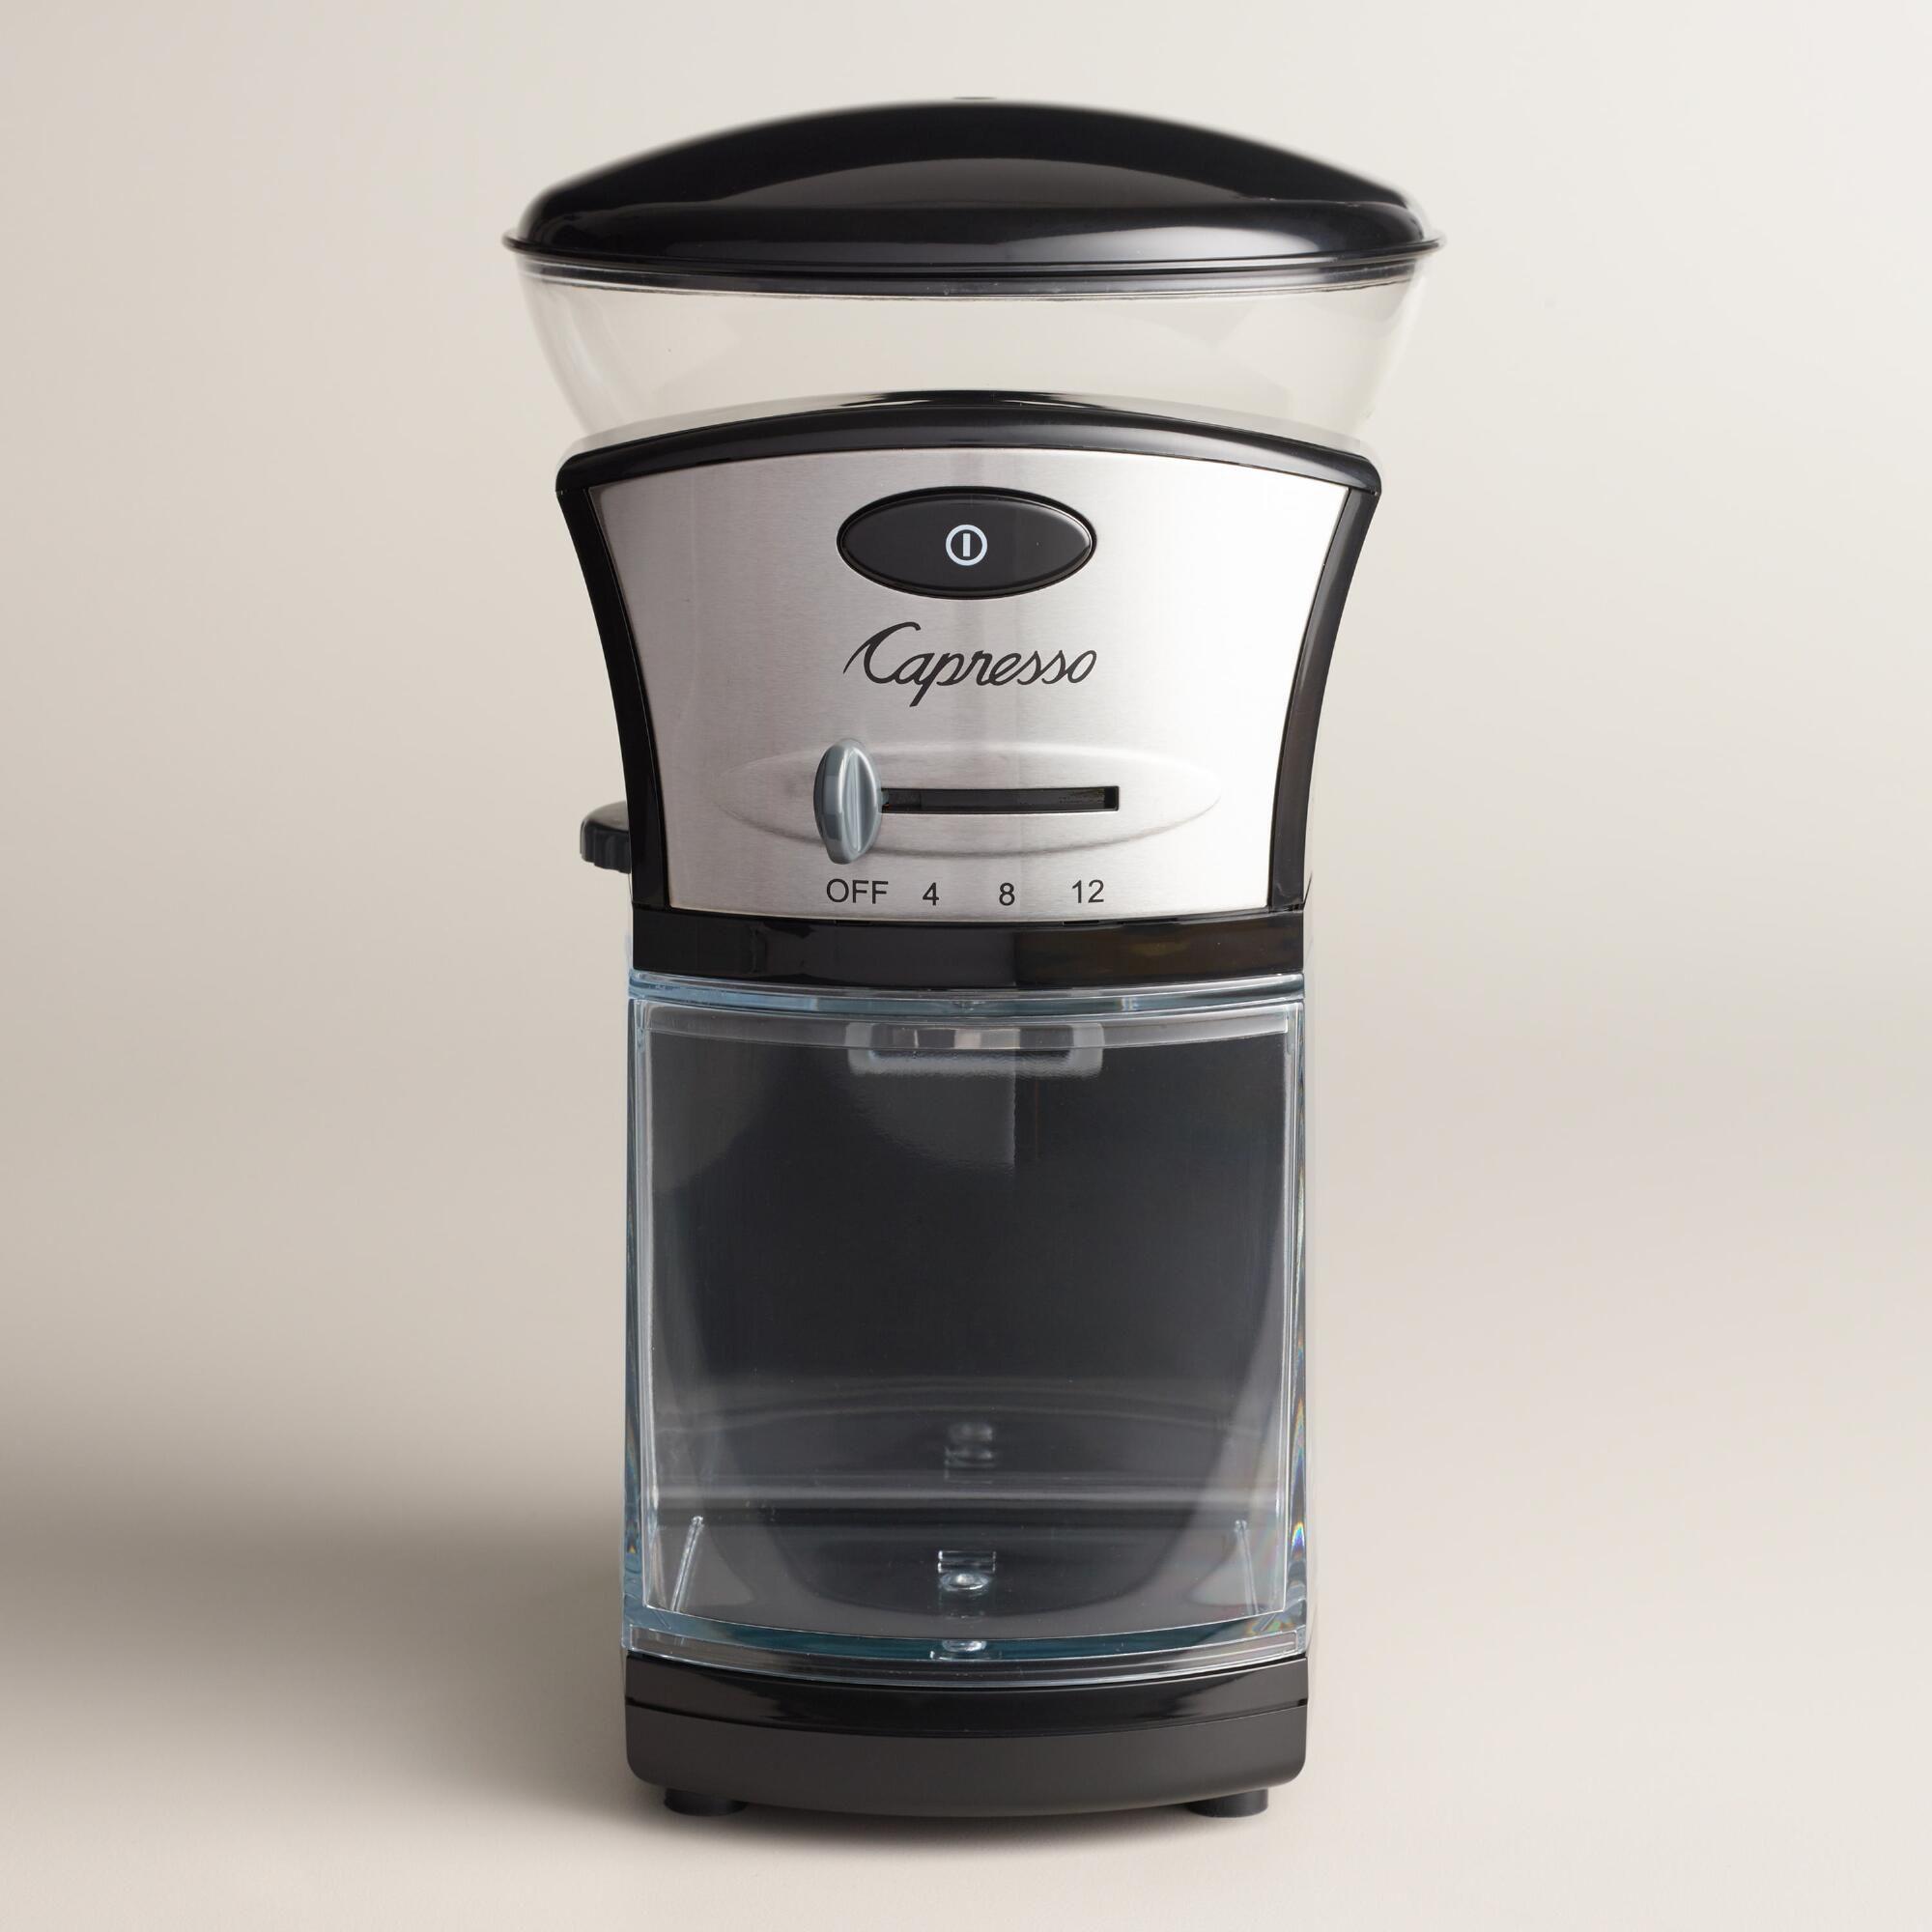 Capresso Electric Burr Coffee Grinder Burr coffee